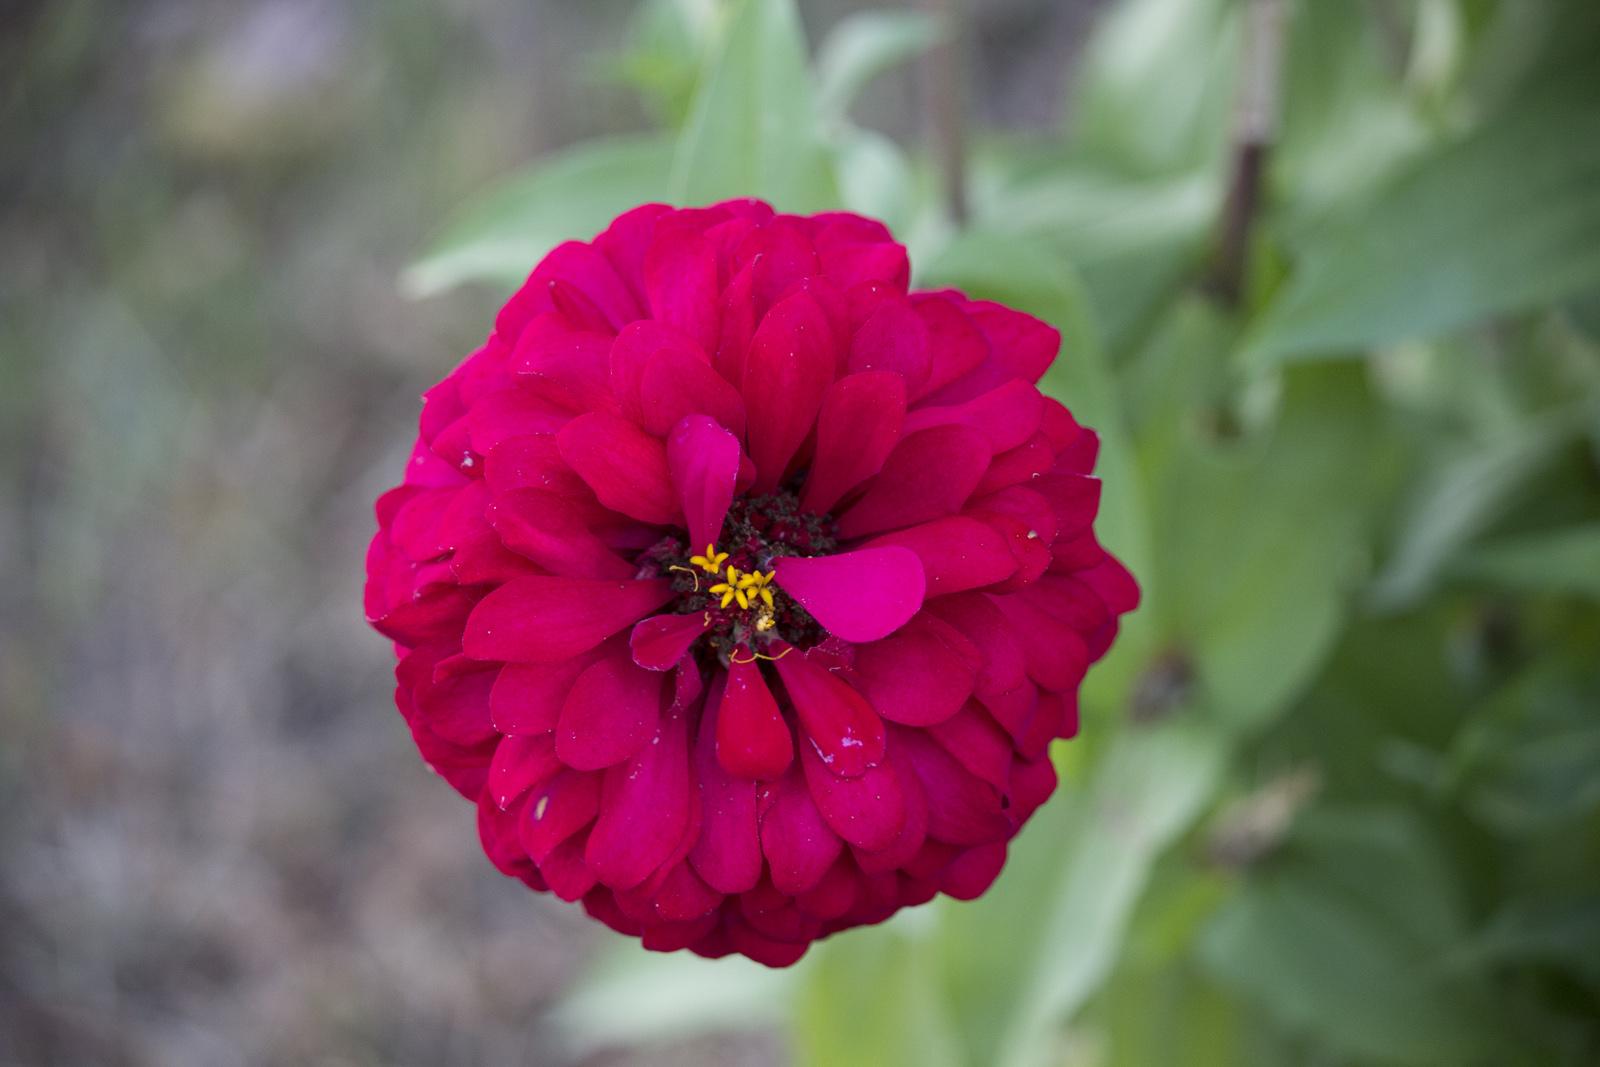 Vibrant Flower Close-up #2